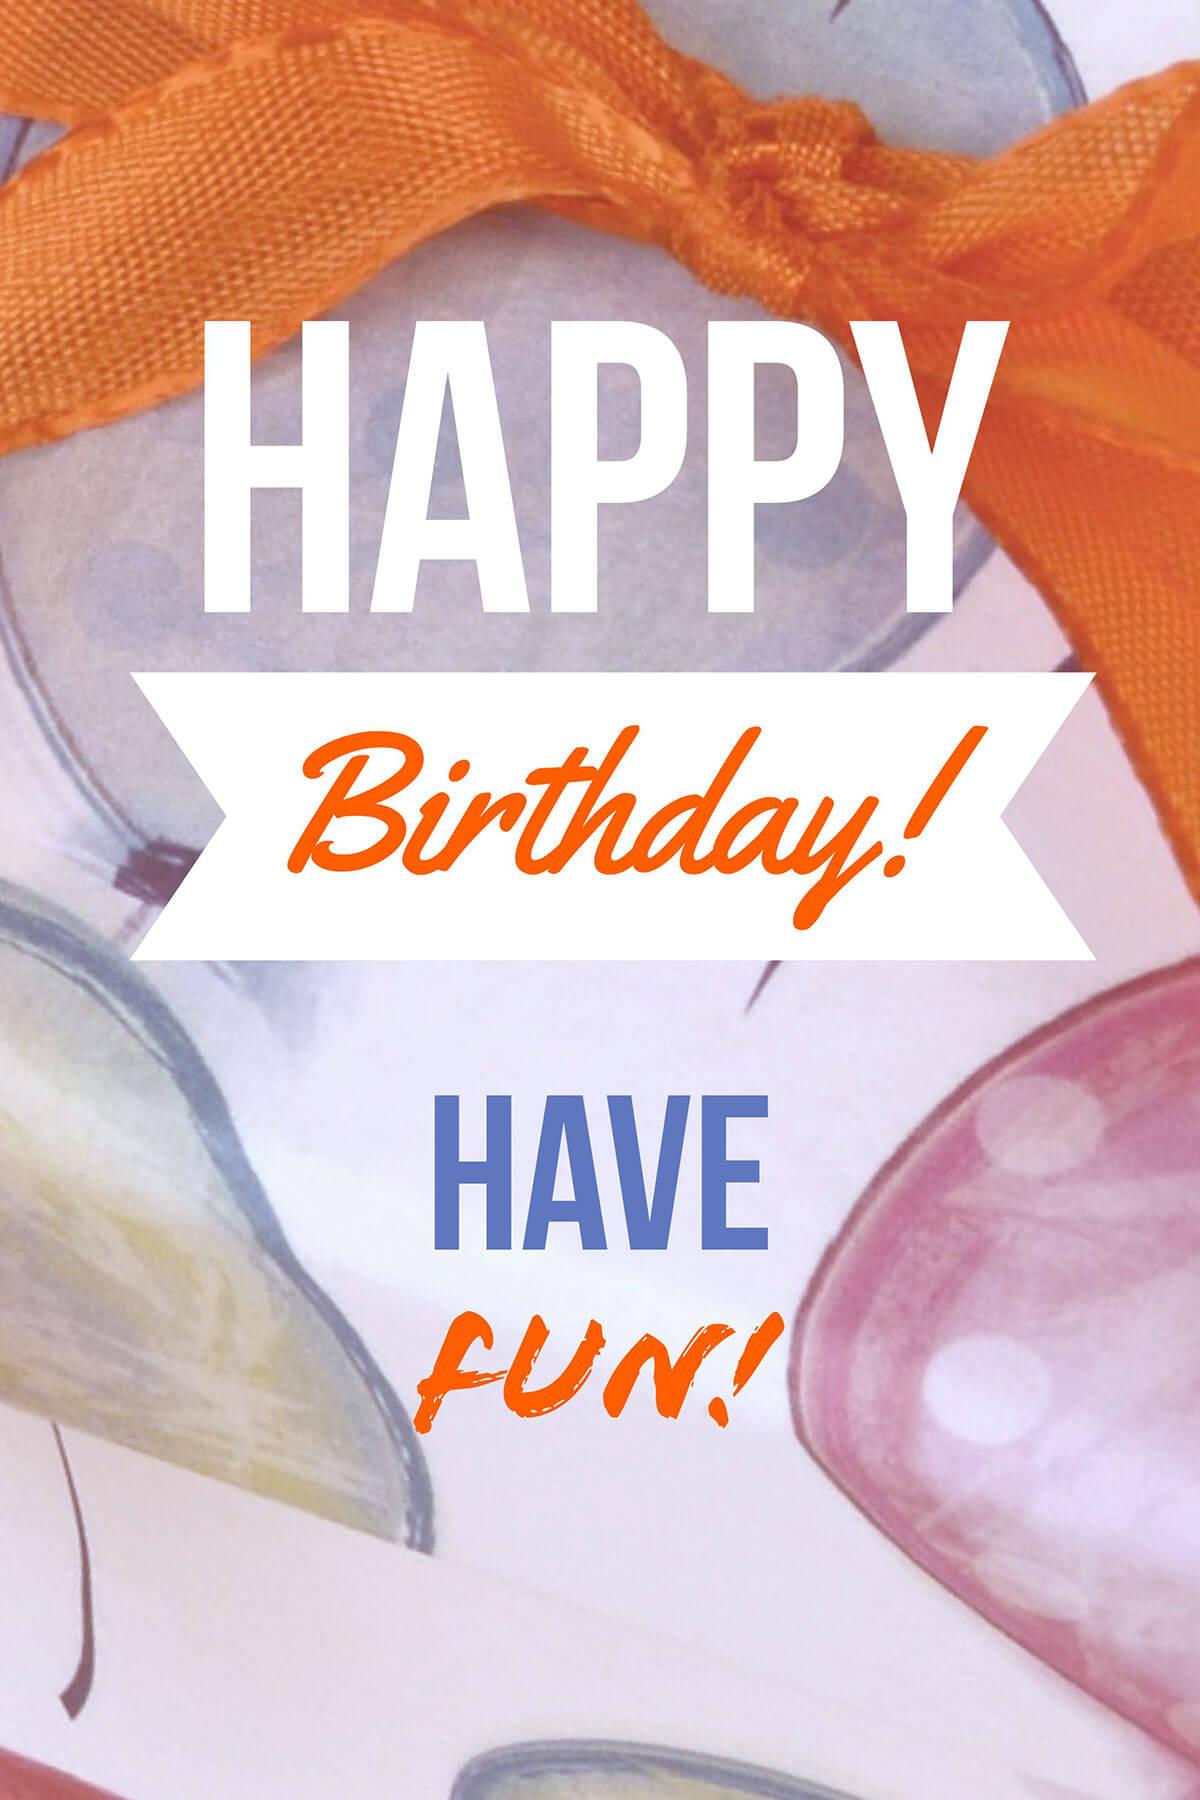 Free Online Card Maker: Create Custom Greeting Cards | Adobe Spark - Customized Birthday Cards Free Printable